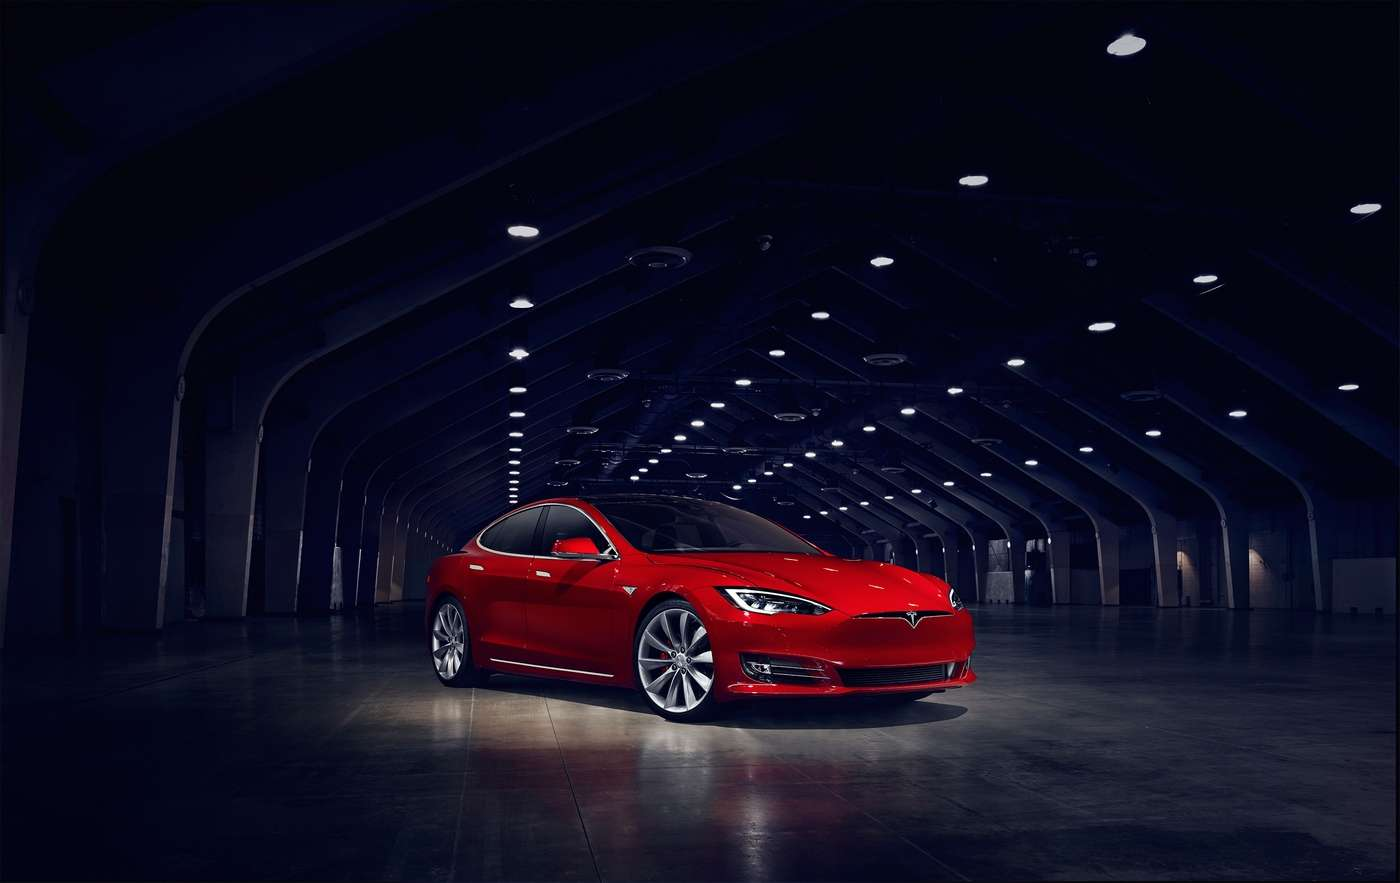 La Tesla Model S remporte la palme de l'autonomie devant sa petite sœur la Model 3. © Tesla